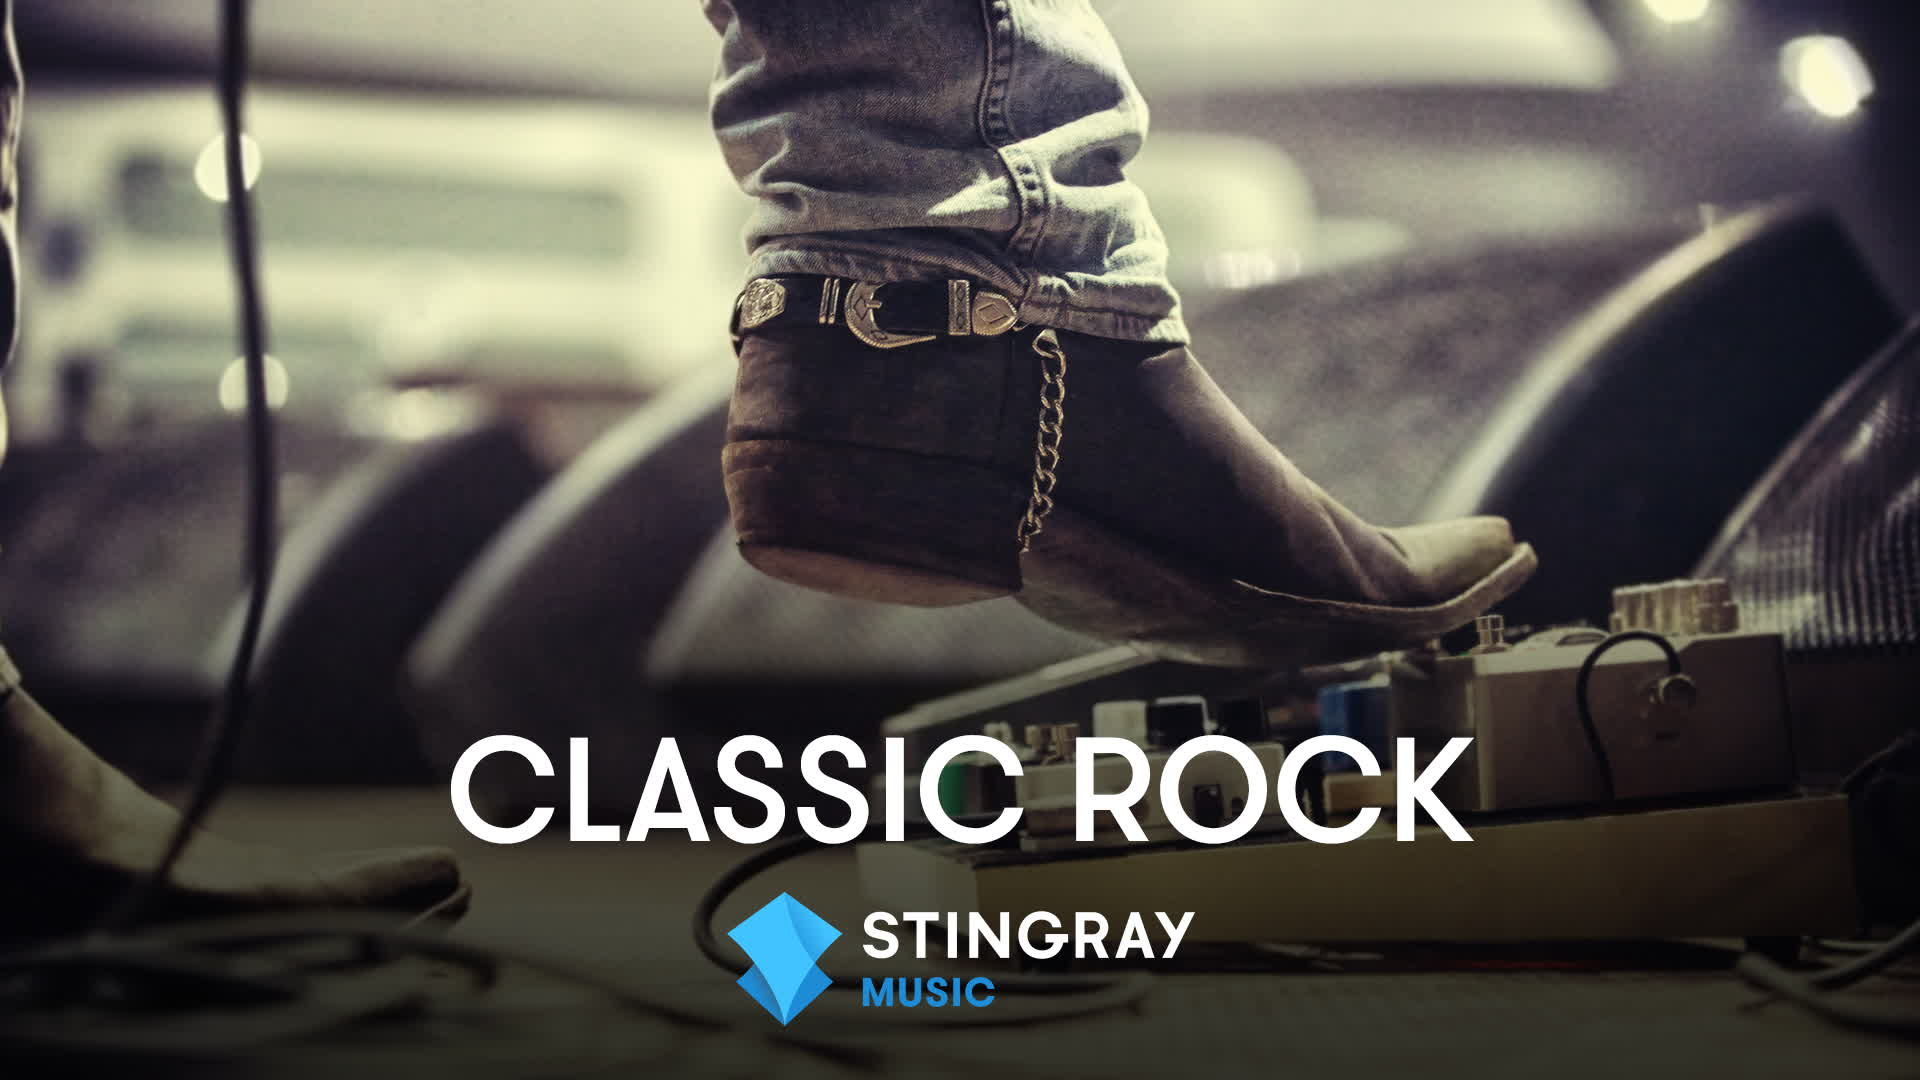 Stingray Classic Rock